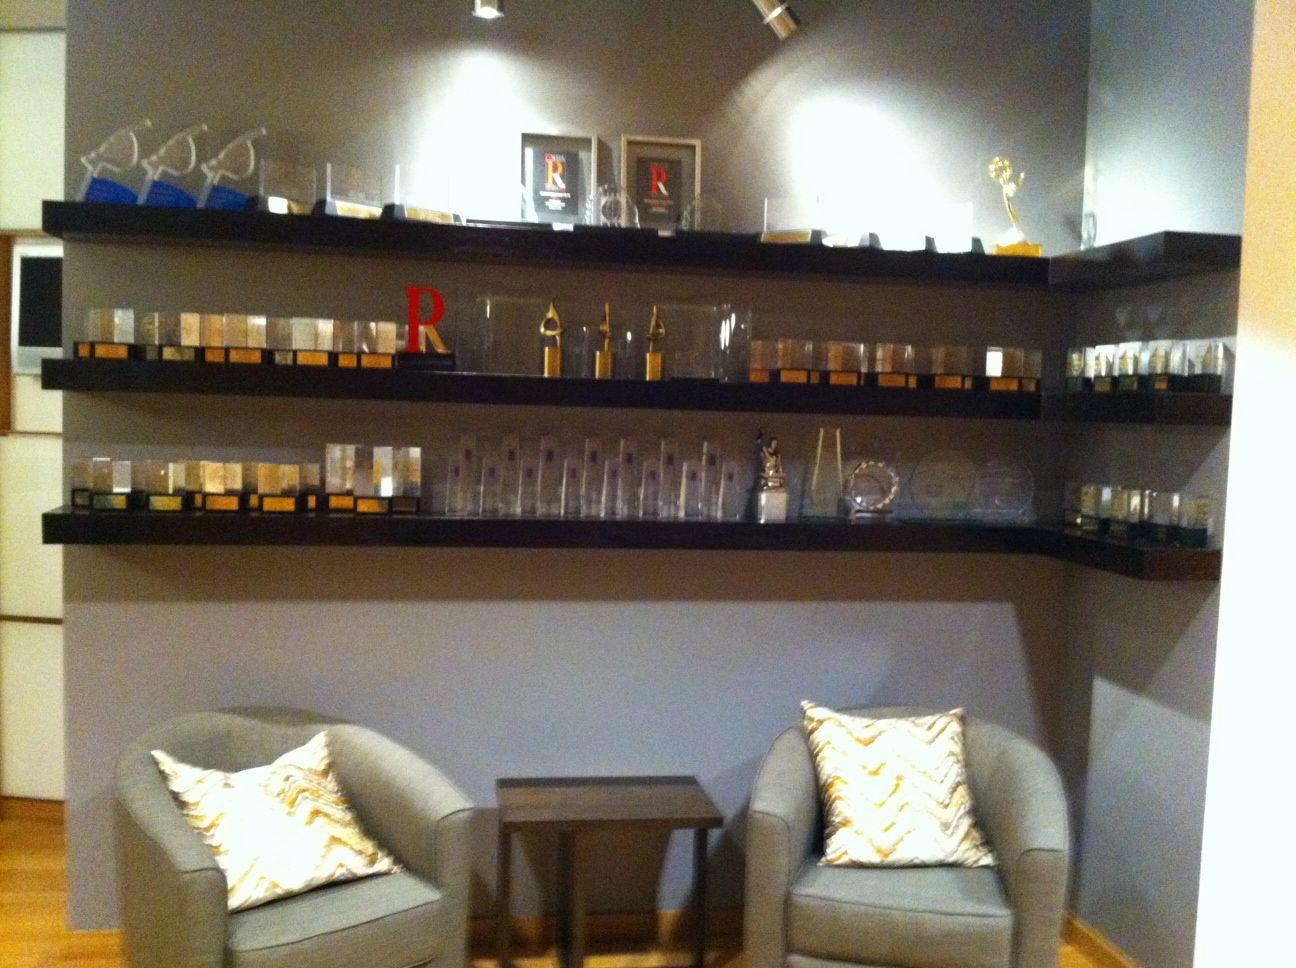 Marvelous Best 25+ Trophy Display Ideas On Pinterest | Trophy Shelf, Sports  Activities And Baseball Shelf